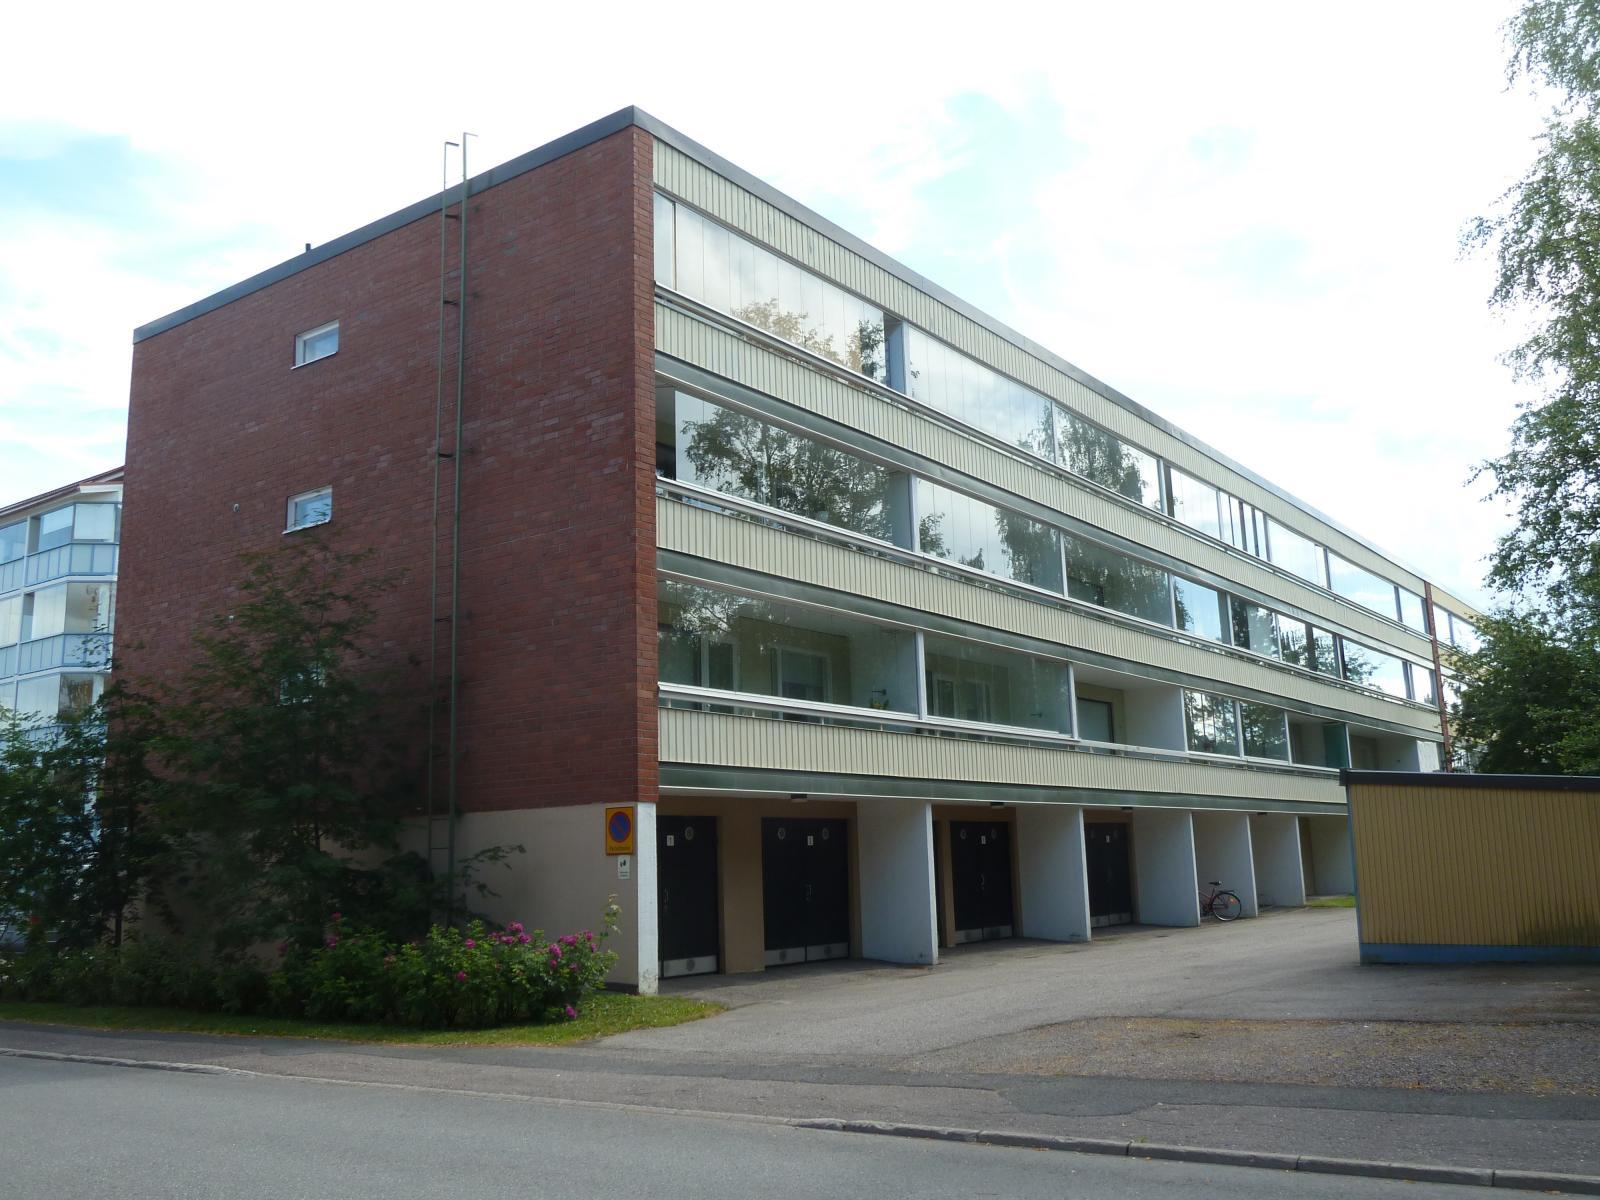 Vesikoskenkatu 26 B19, Loimaa